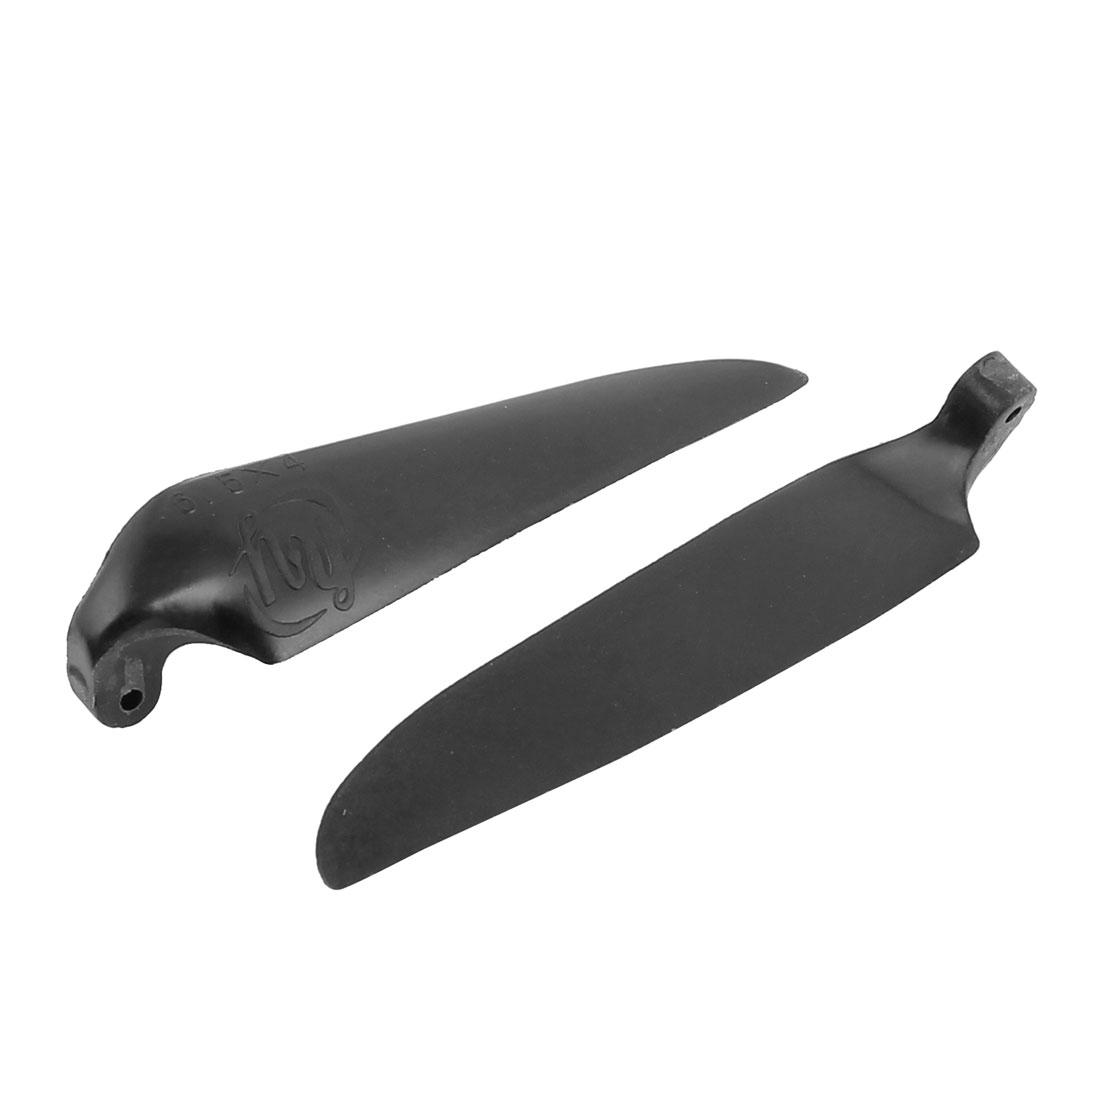 Pair RC Glider Plane Black Plastic Folding Propeller Vanes 6.5 x 4 Inch